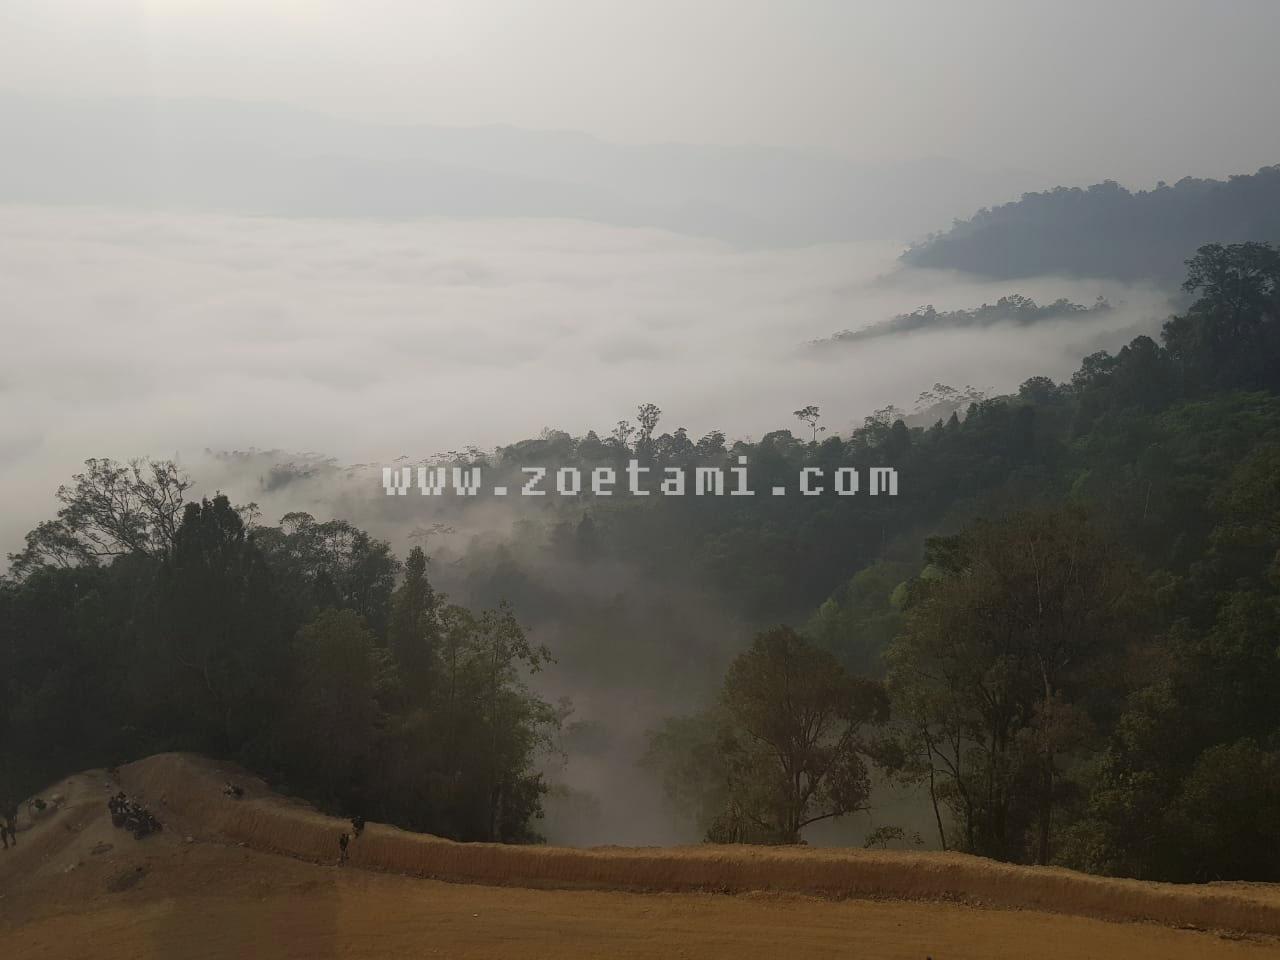 Info Gunung Luhur Ciusul Citorek yang Viral